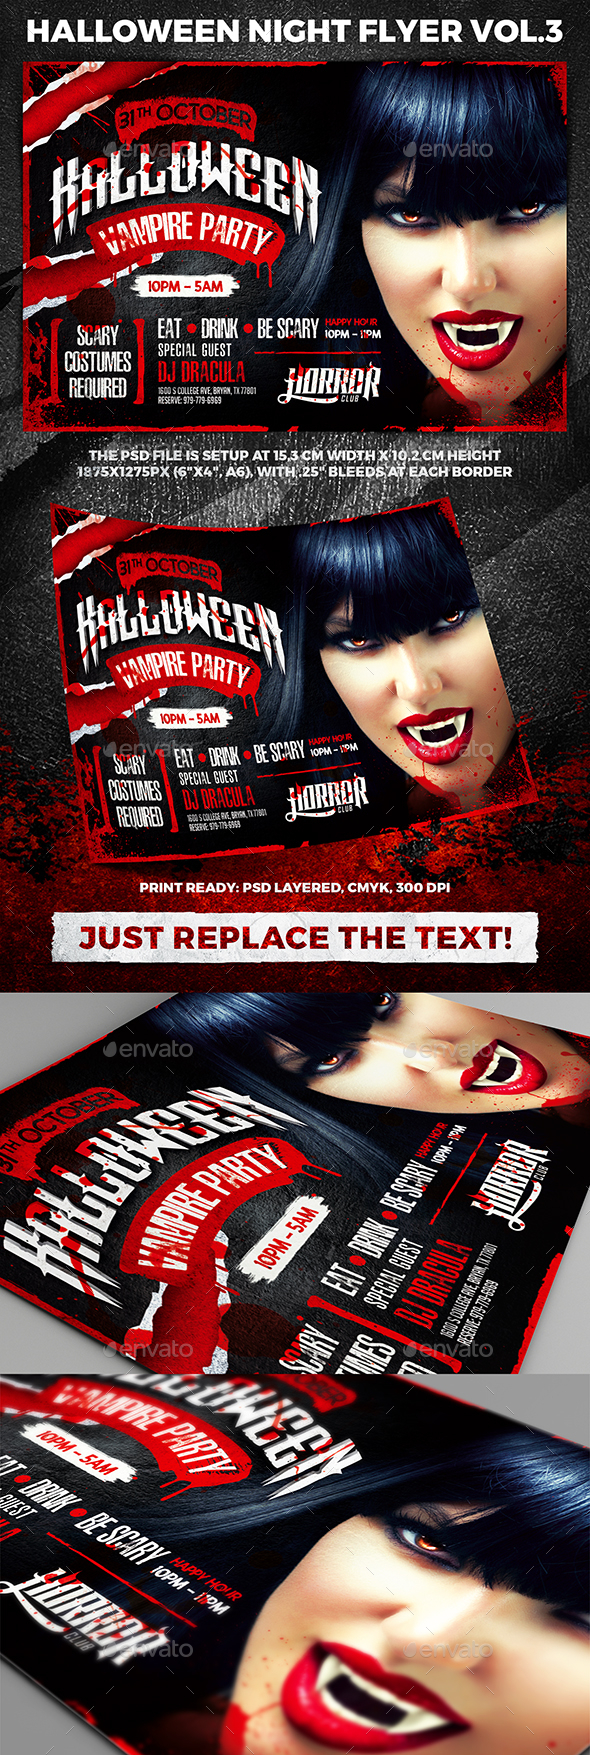 Halloween Night Party Flyer vol.3